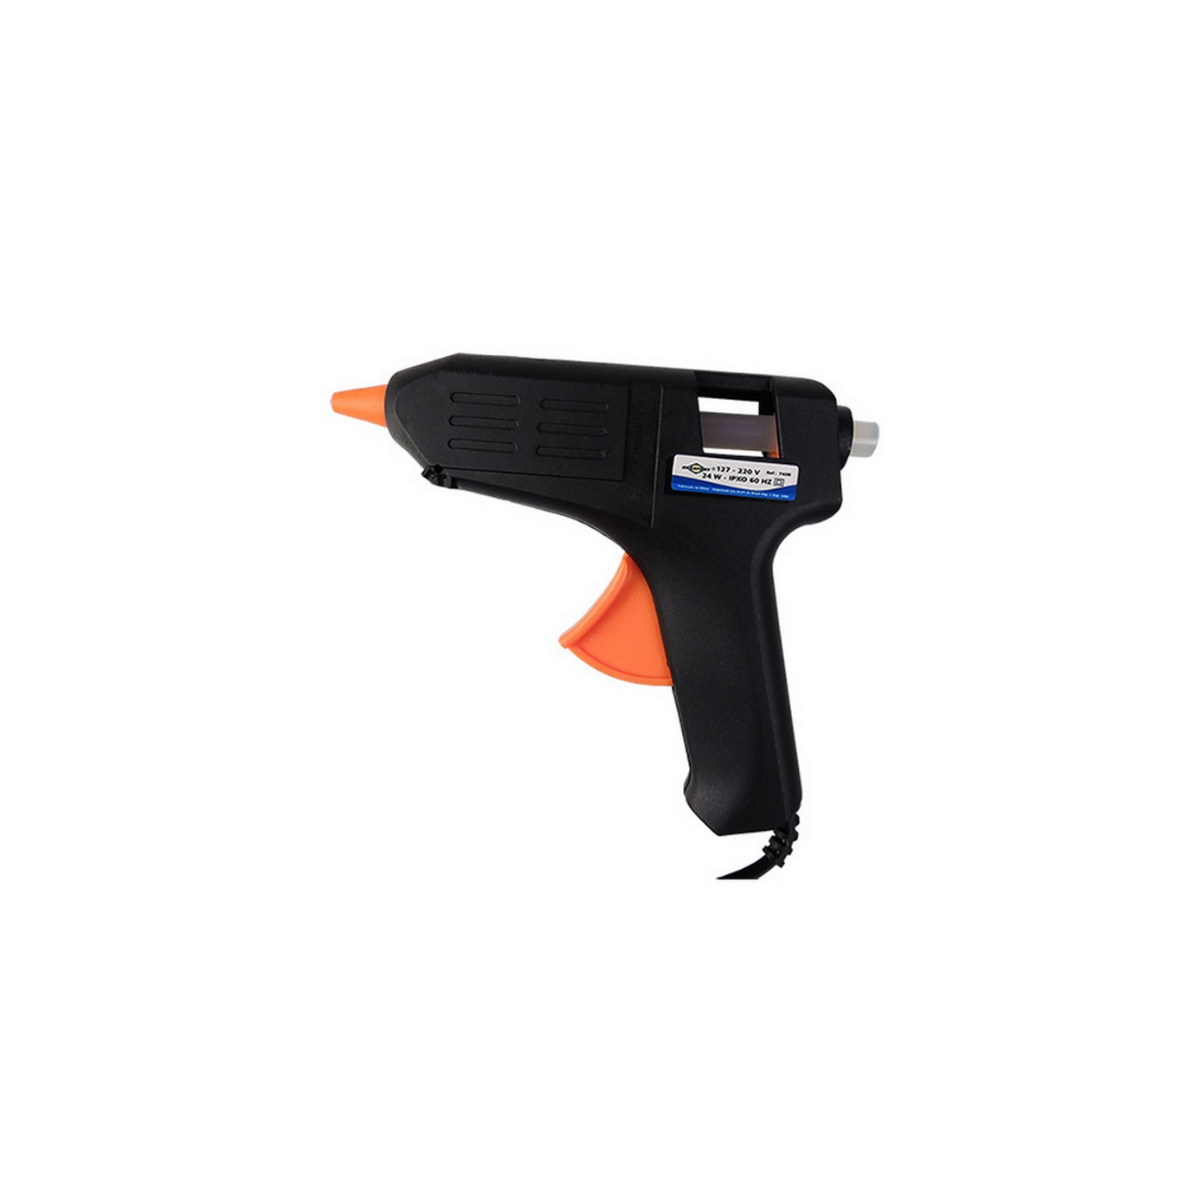 Pistola Aplicadora de Cola Quente 10W Bivolt Brasfort